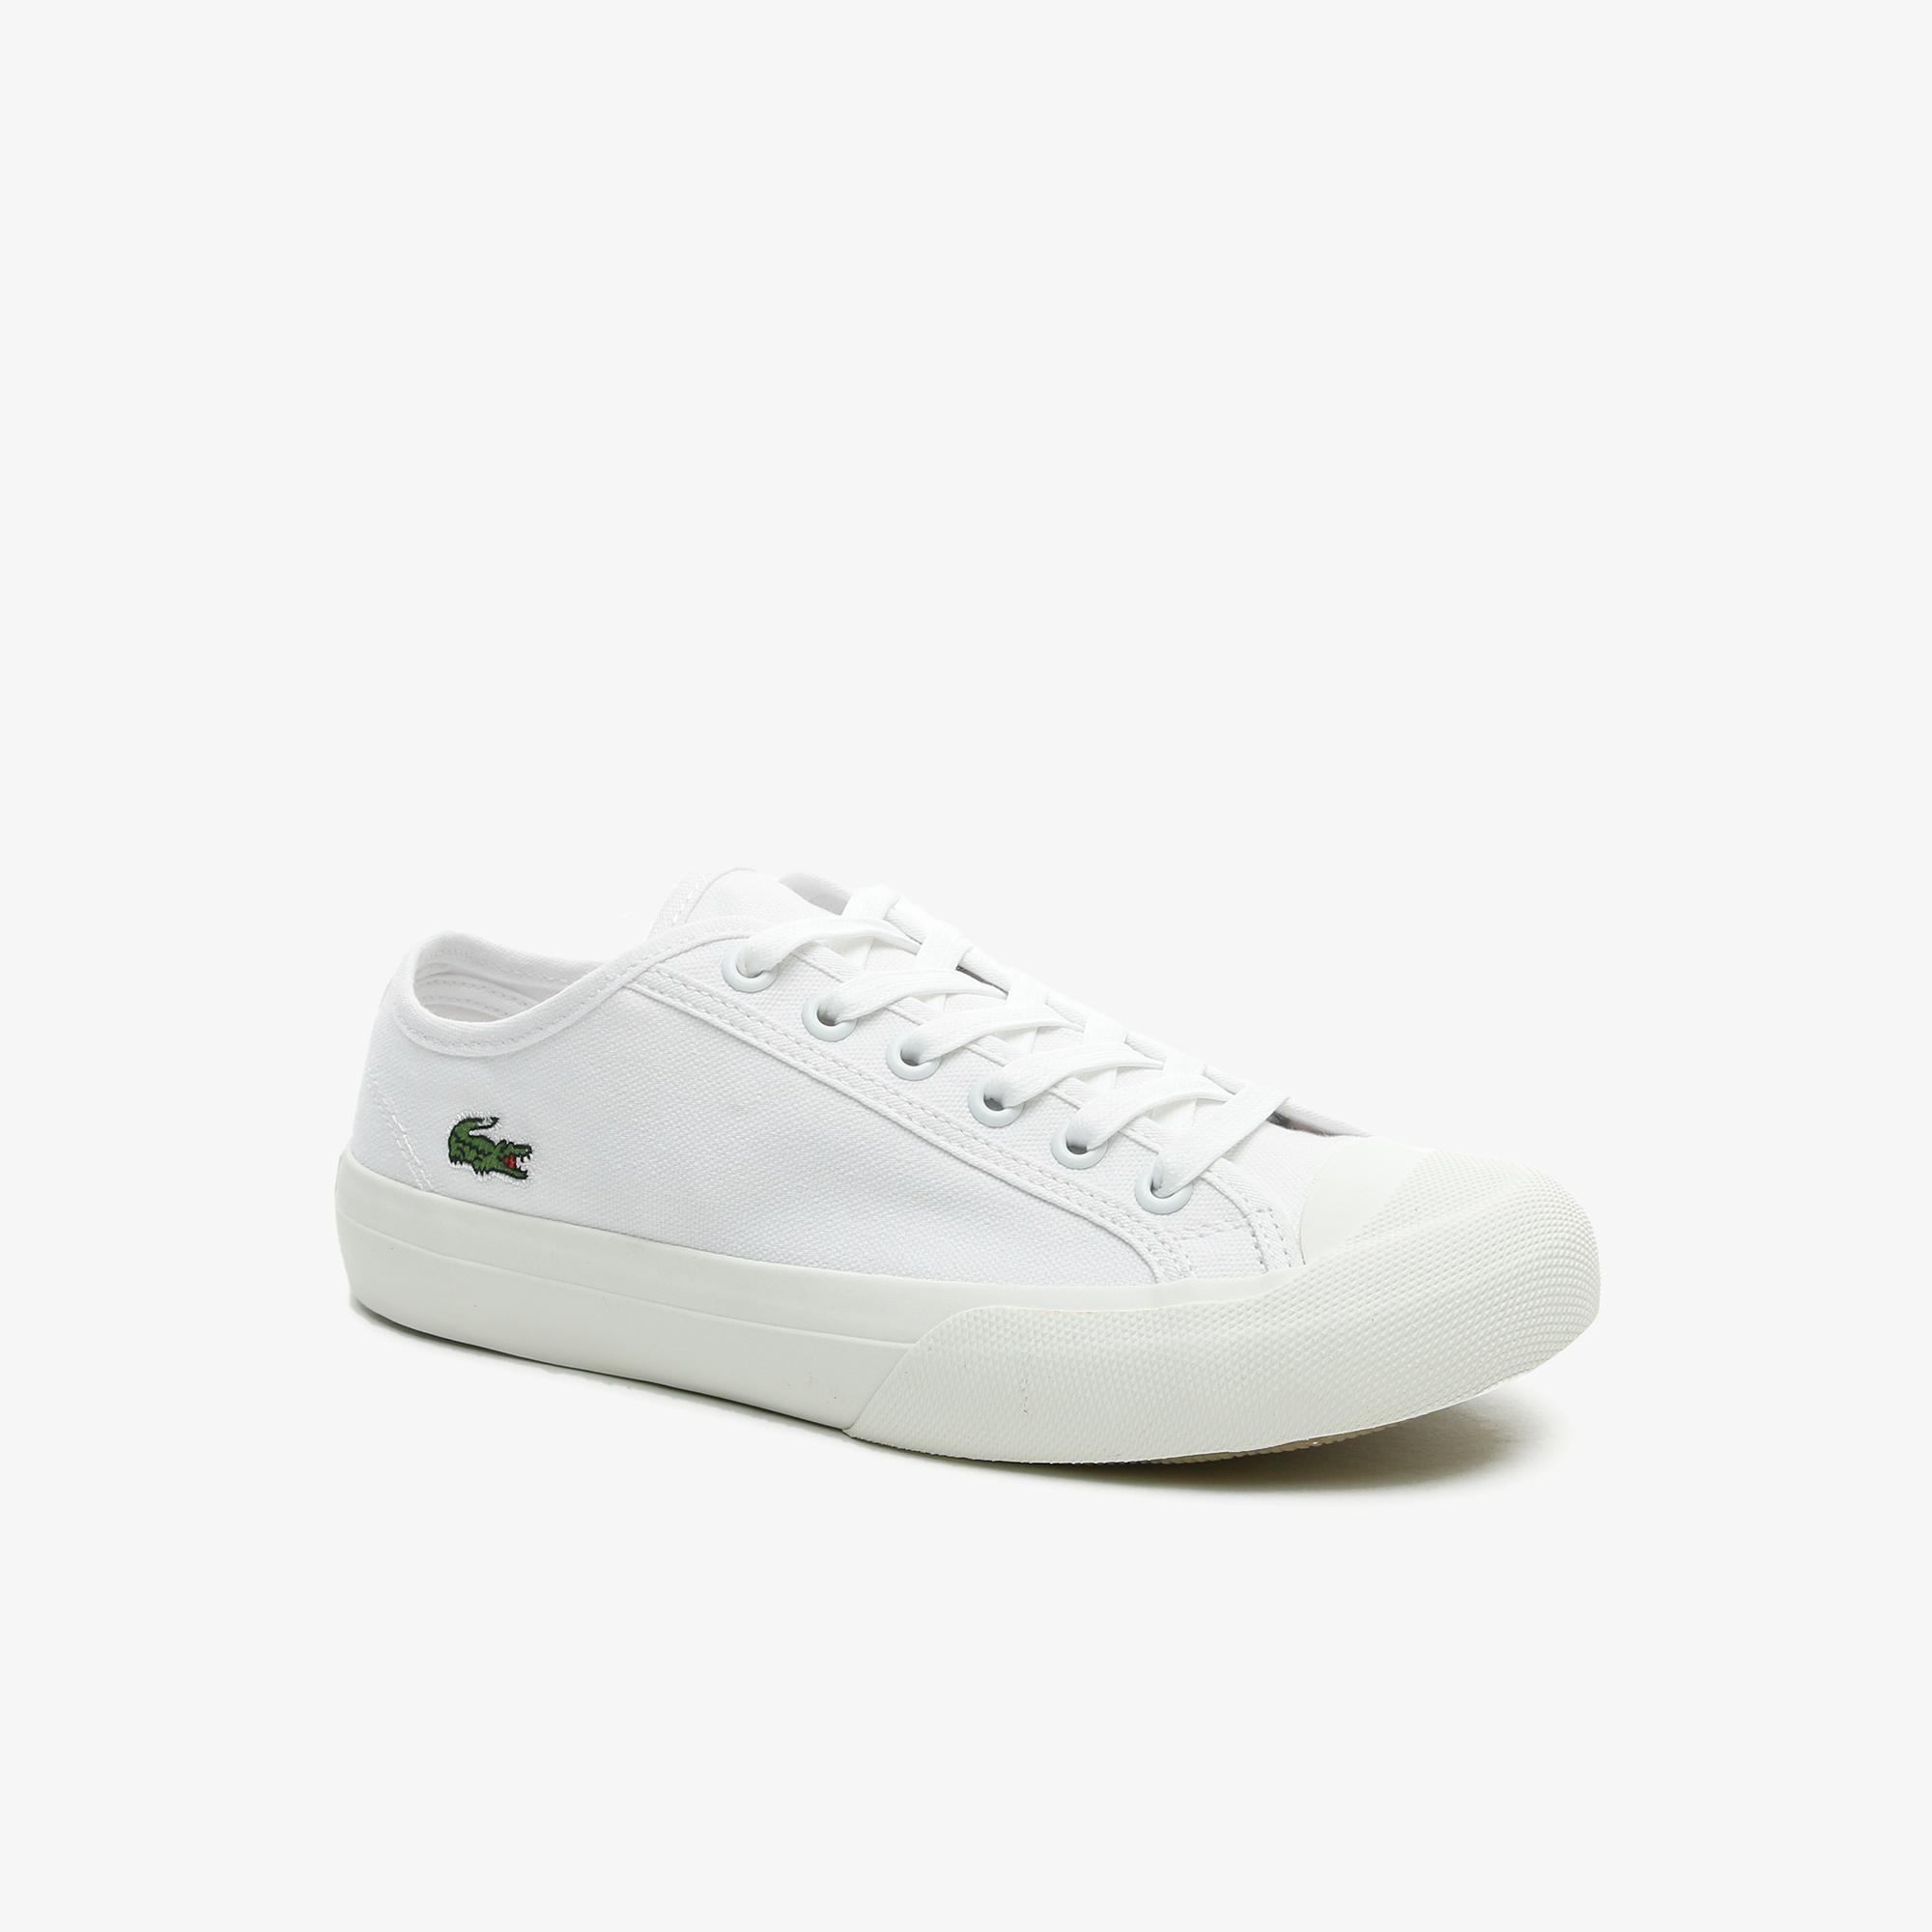 Lacoste Topskill 0721 2 Cfa Kadın Beyaz Sneaker